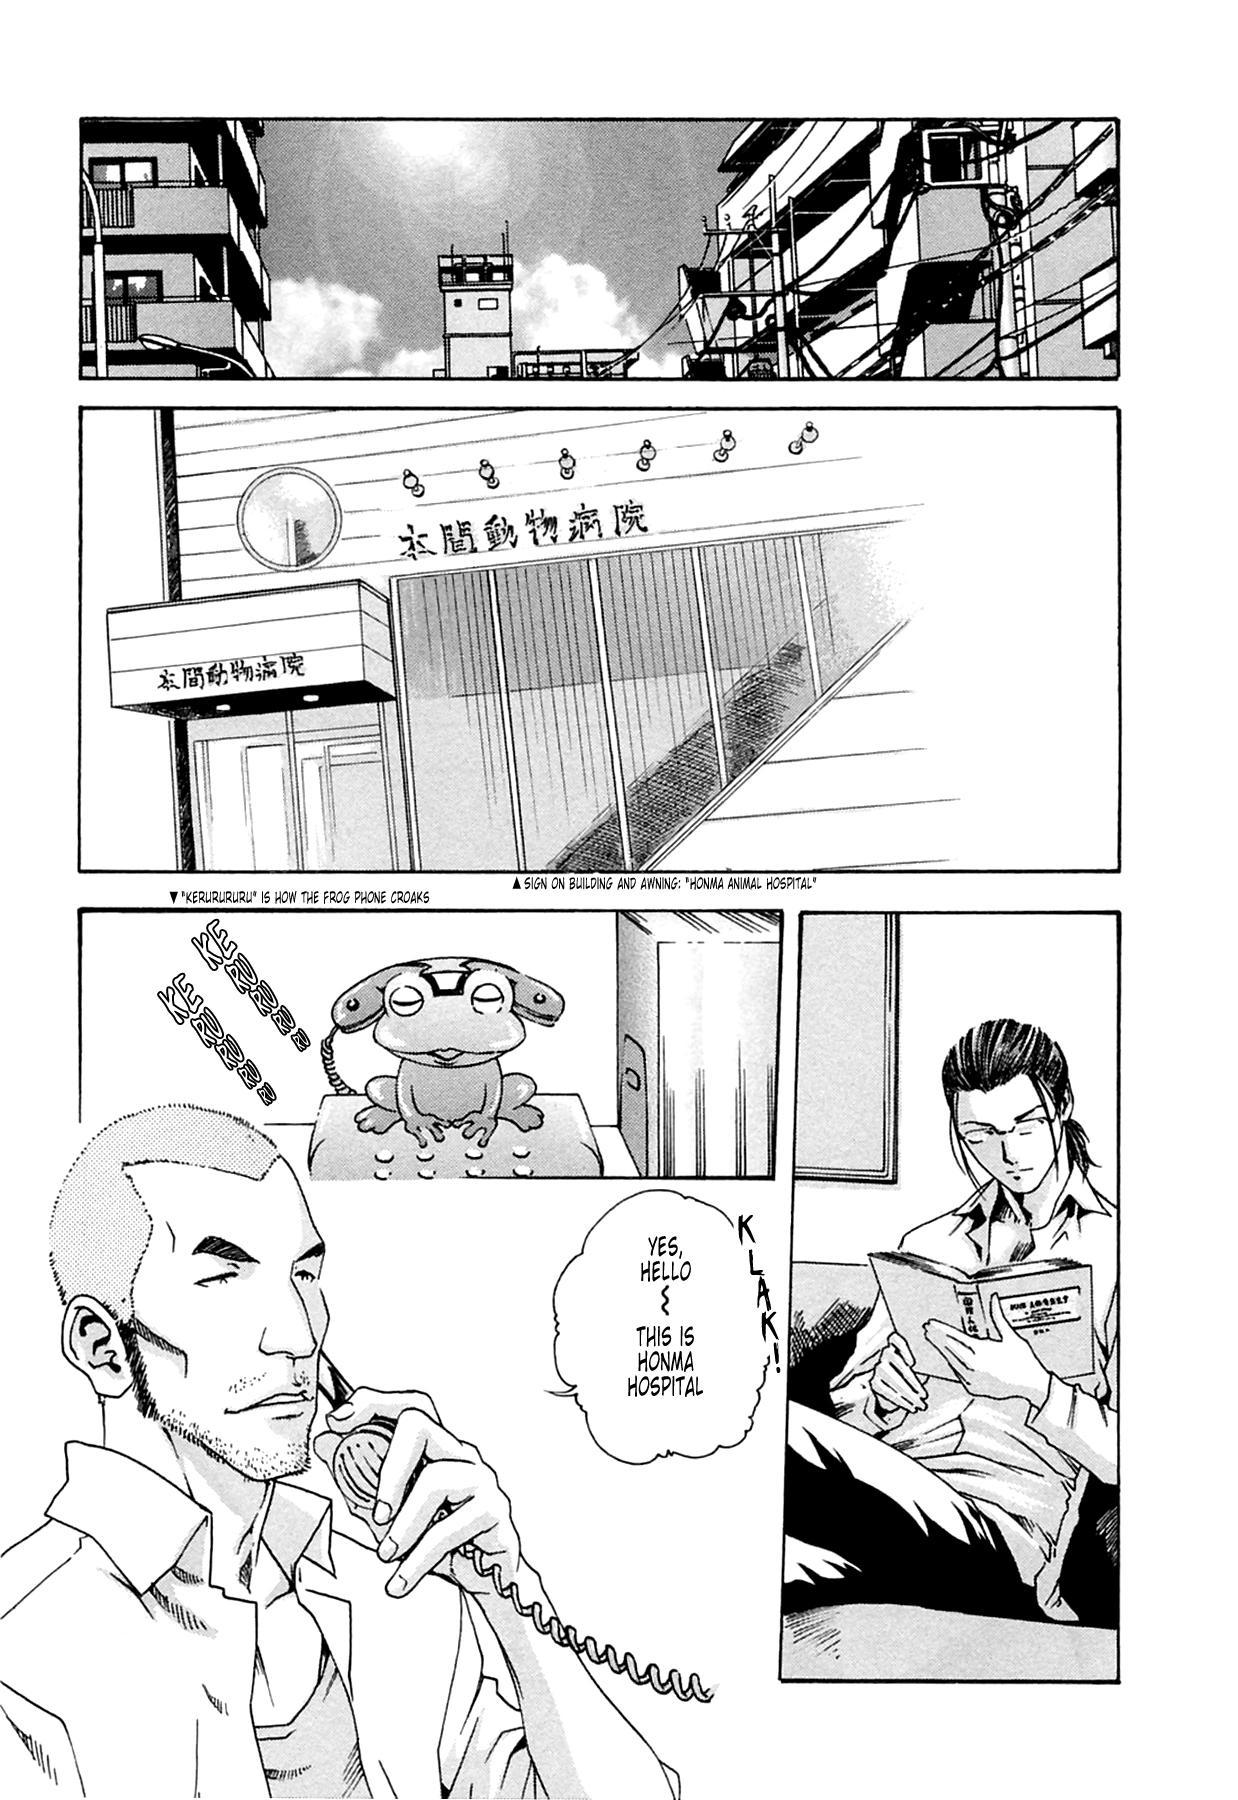 [Haruki] Kisei Juui Suzune (Parasite Doctor Suzune) Vol.02 - CH10-11 12